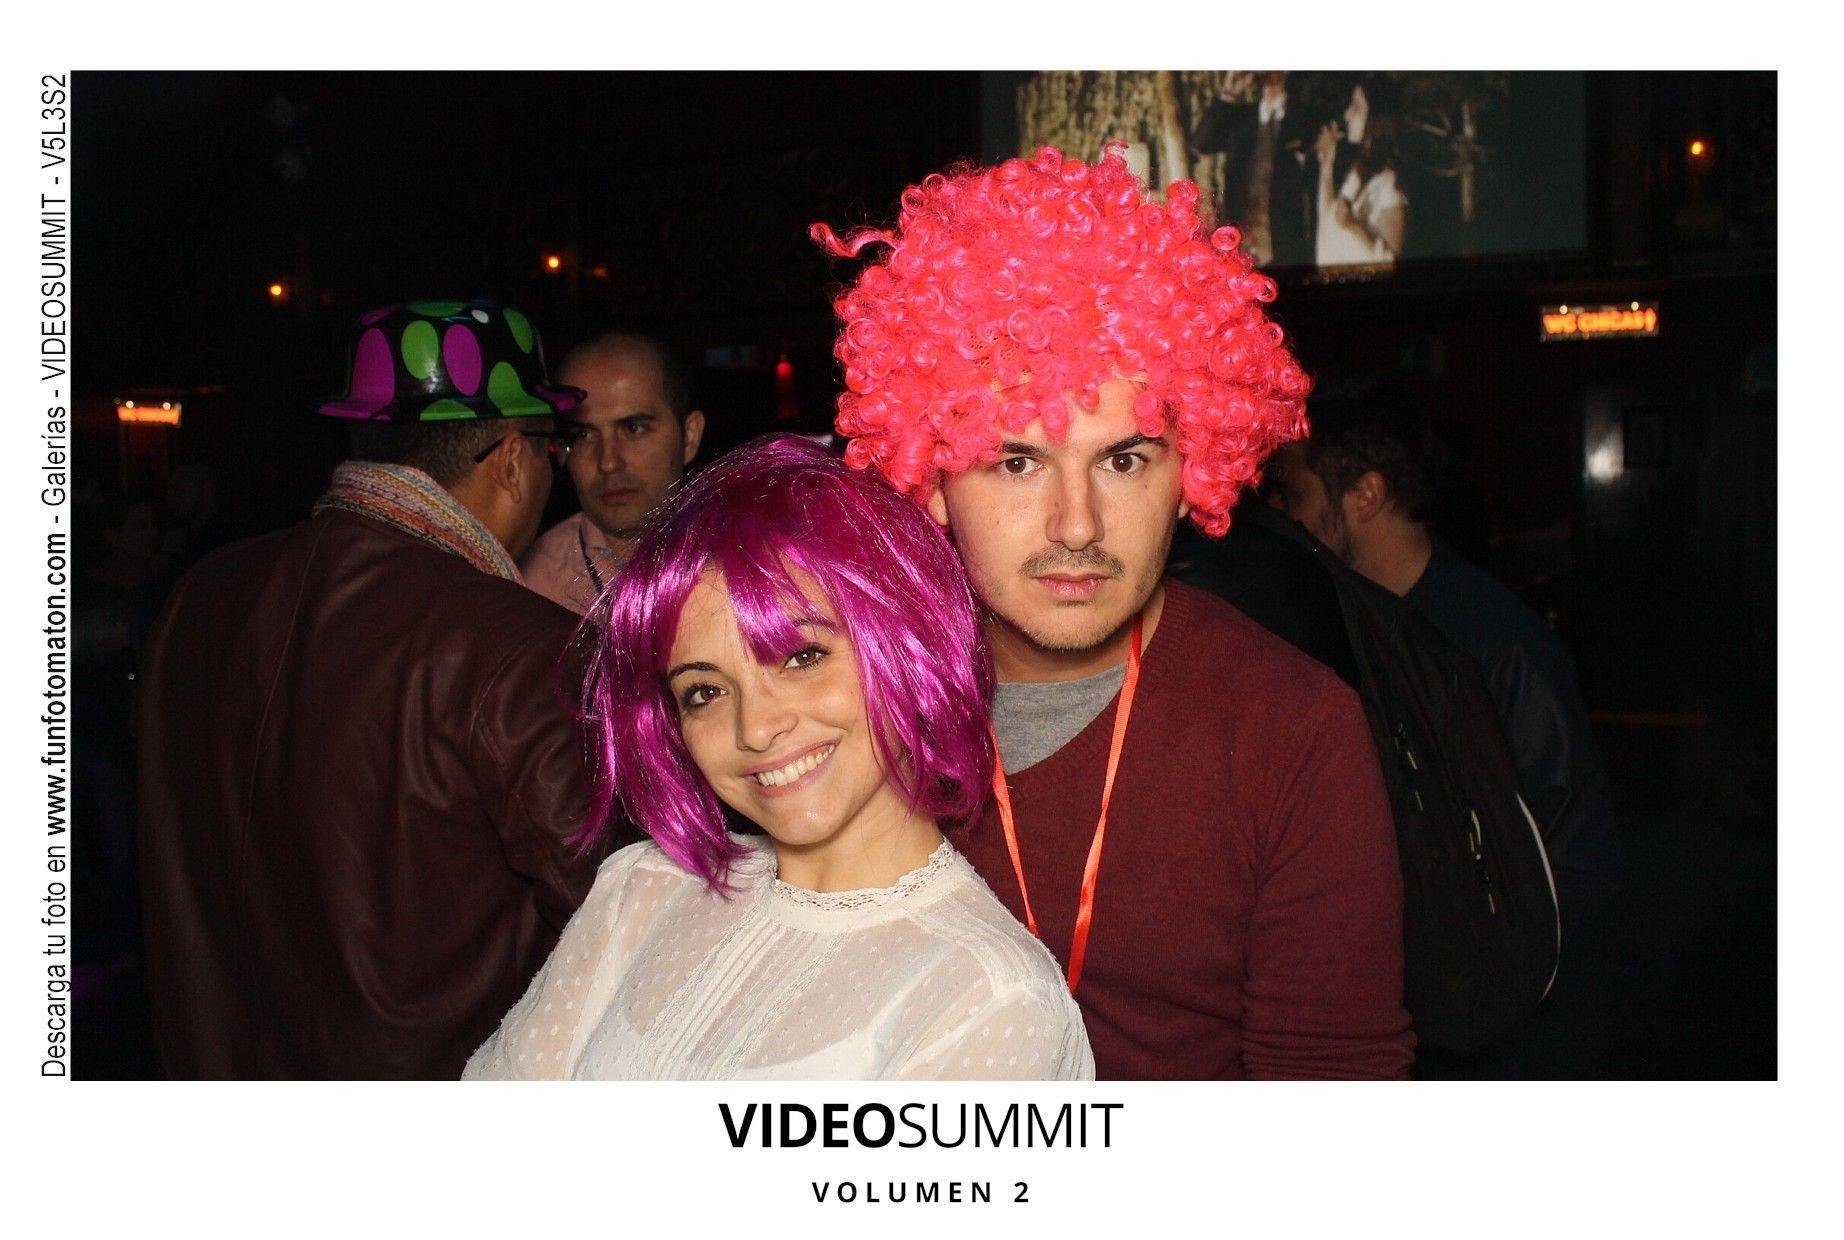 videosummit-vol2-club-party-027